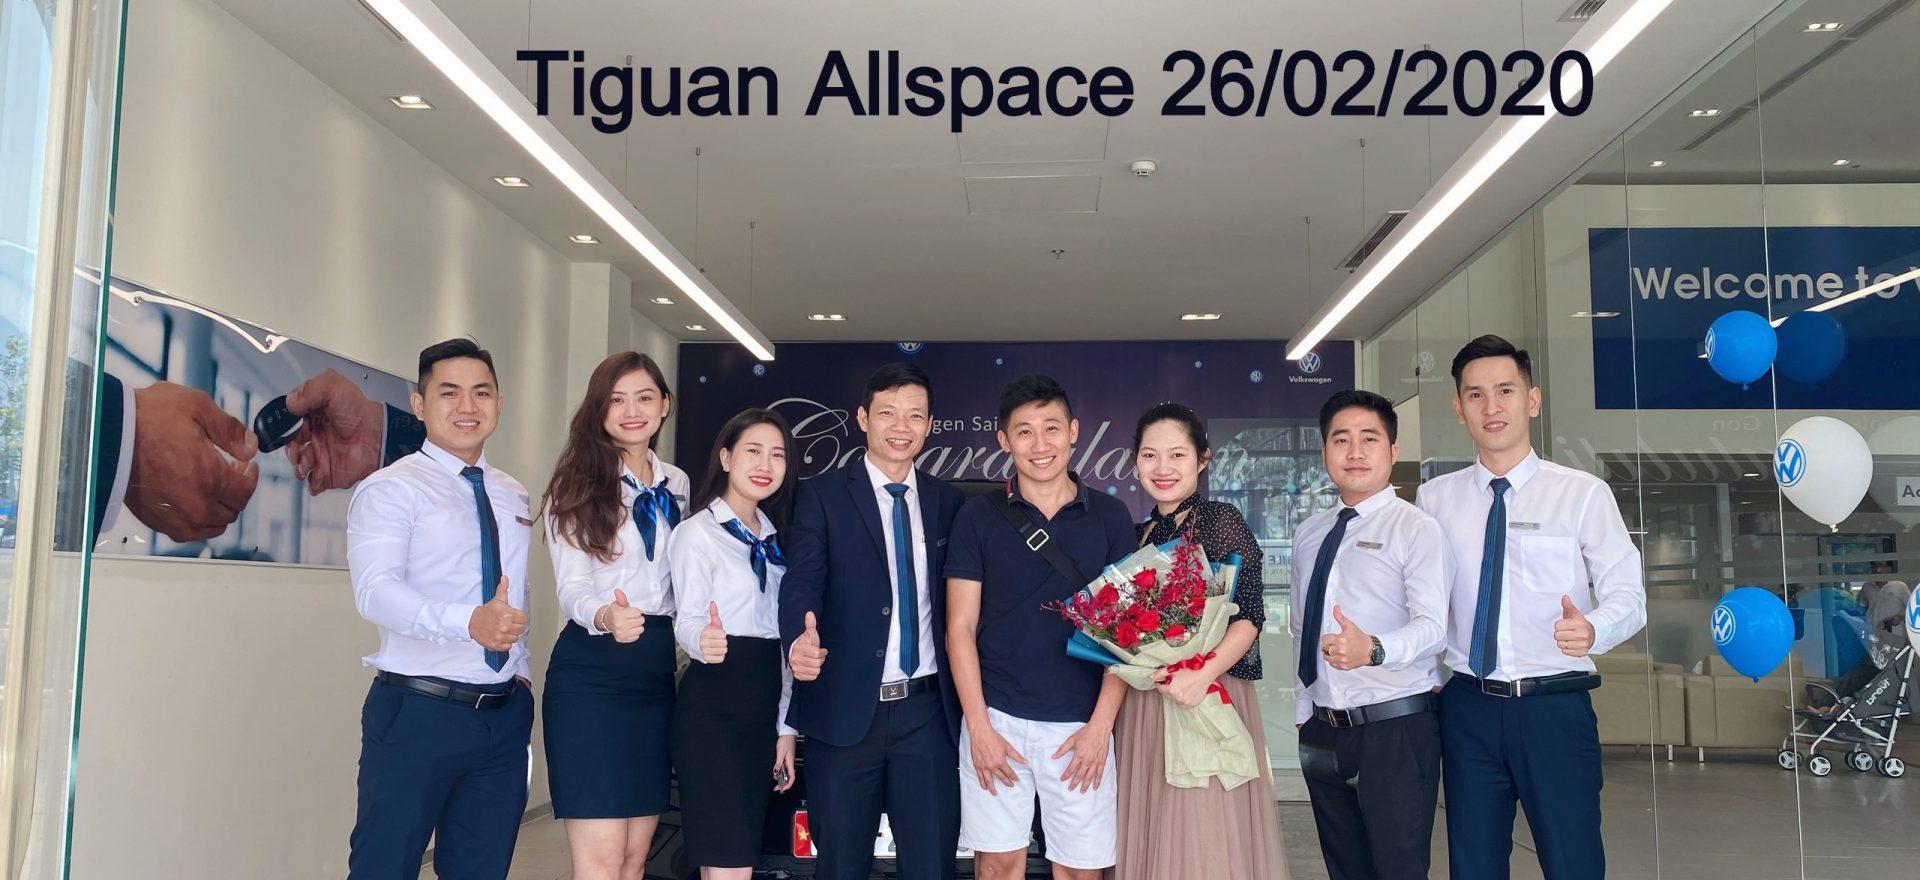 giao-xe-vw-truong-chinh-2020